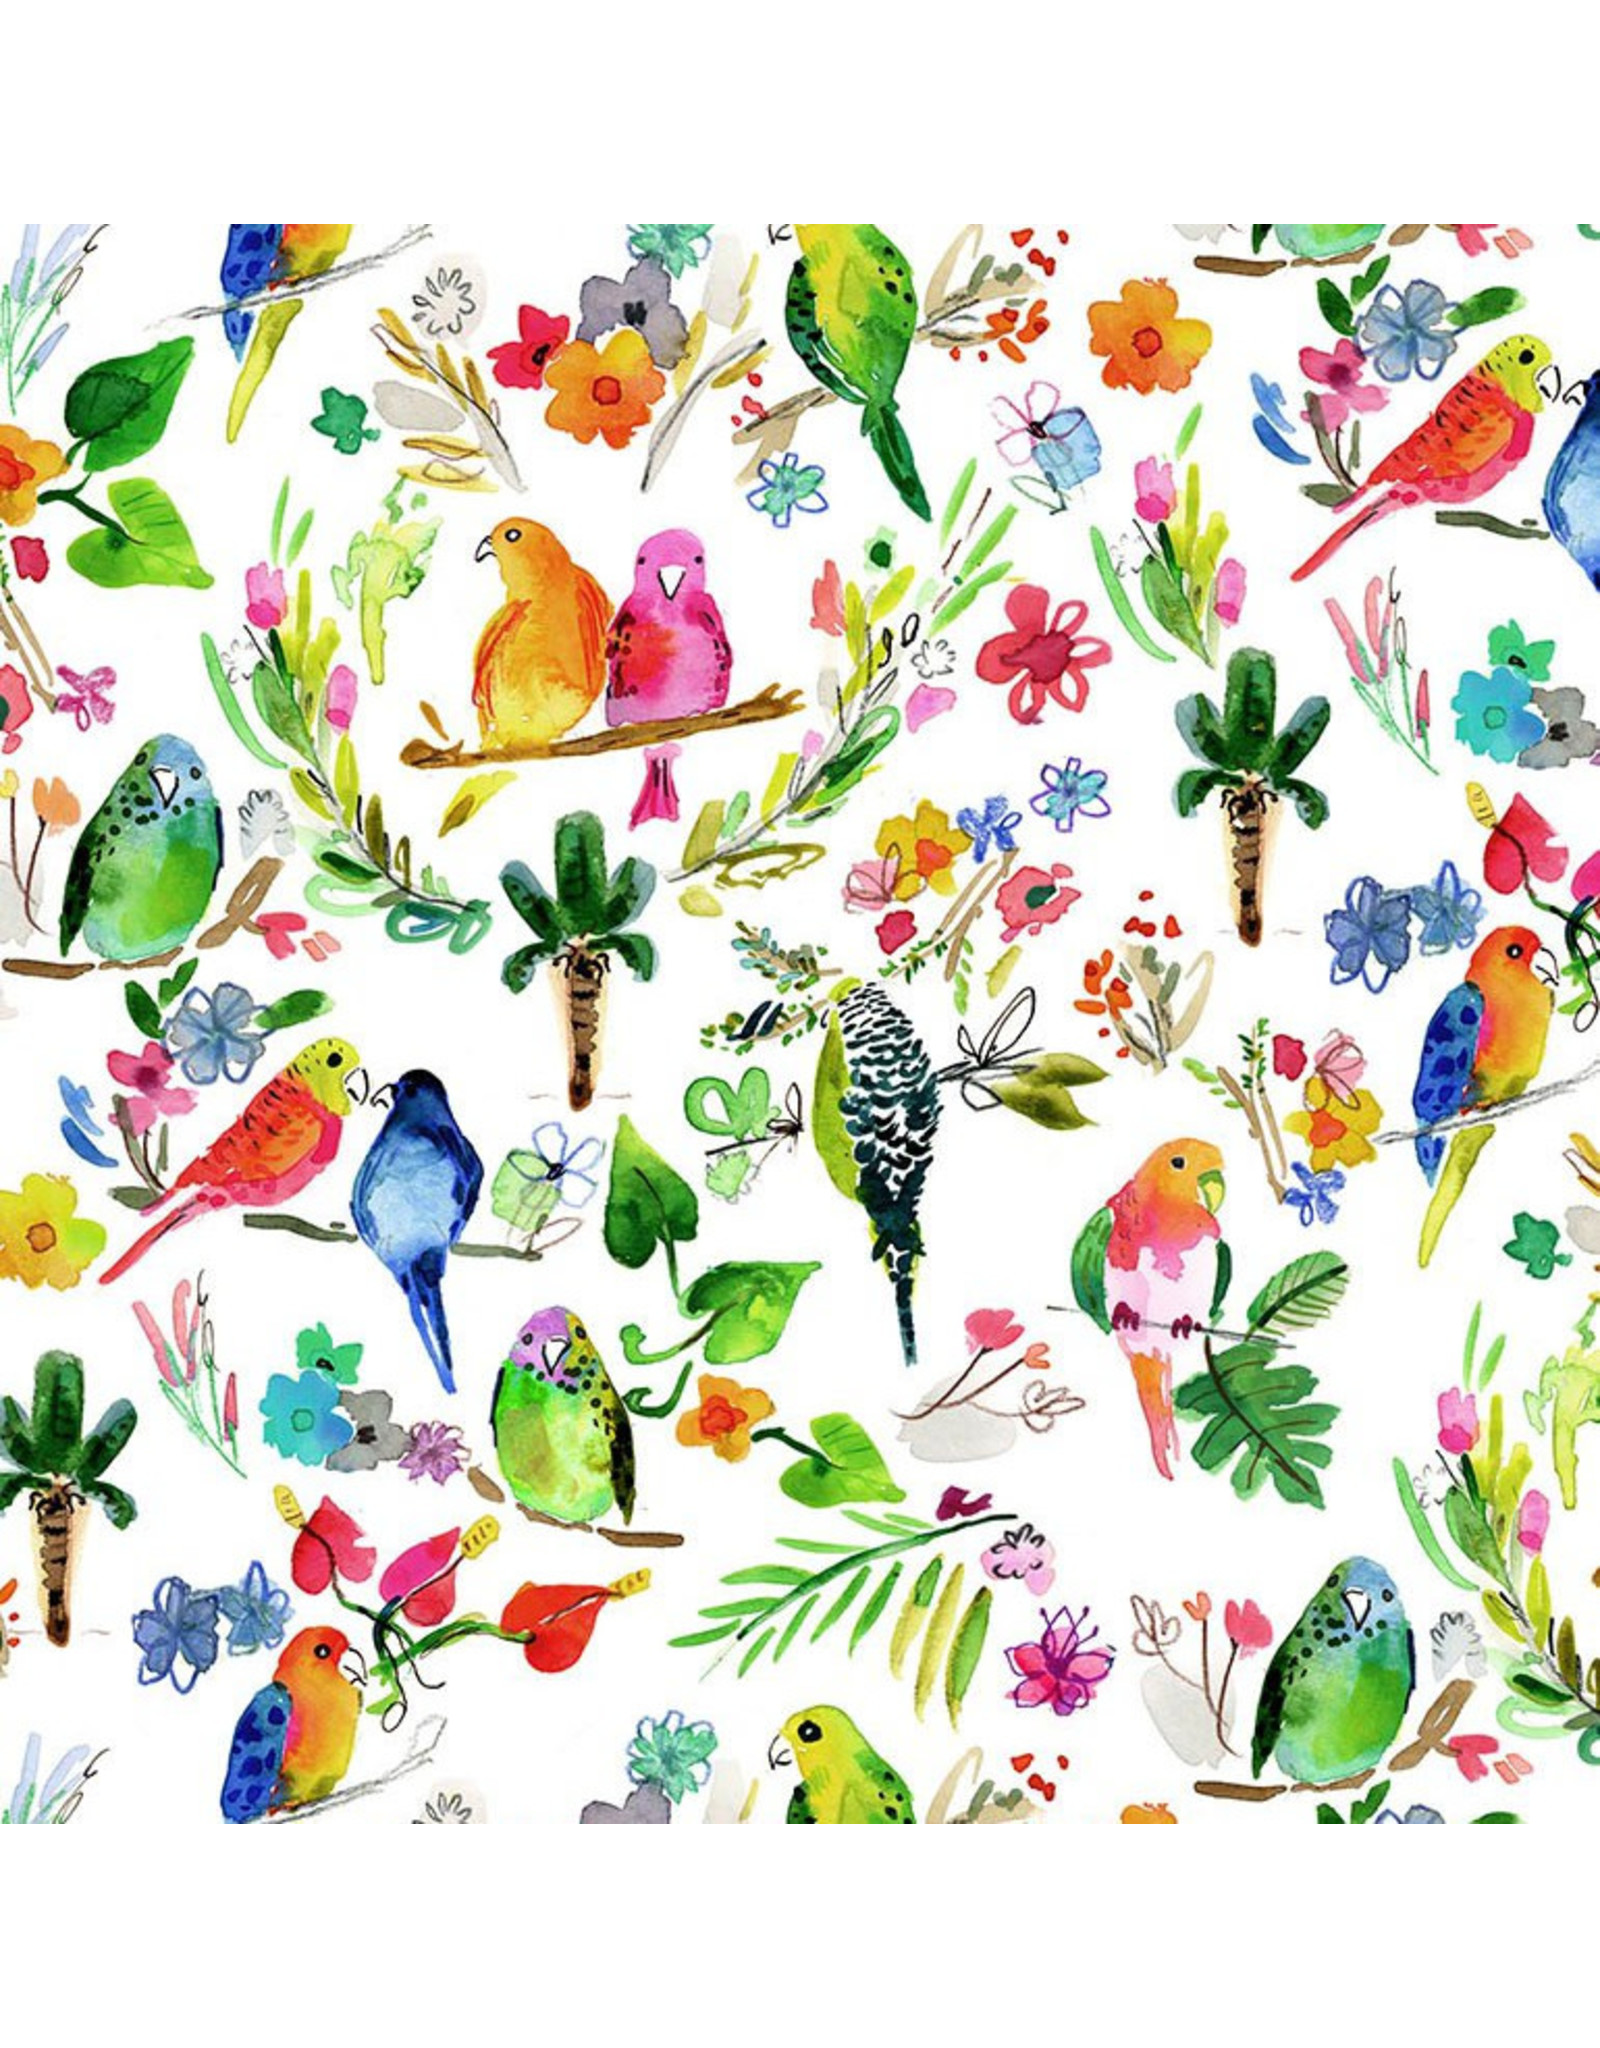 August Wren Paradise Found, Parrots in Multi, Fabric Half-Yards